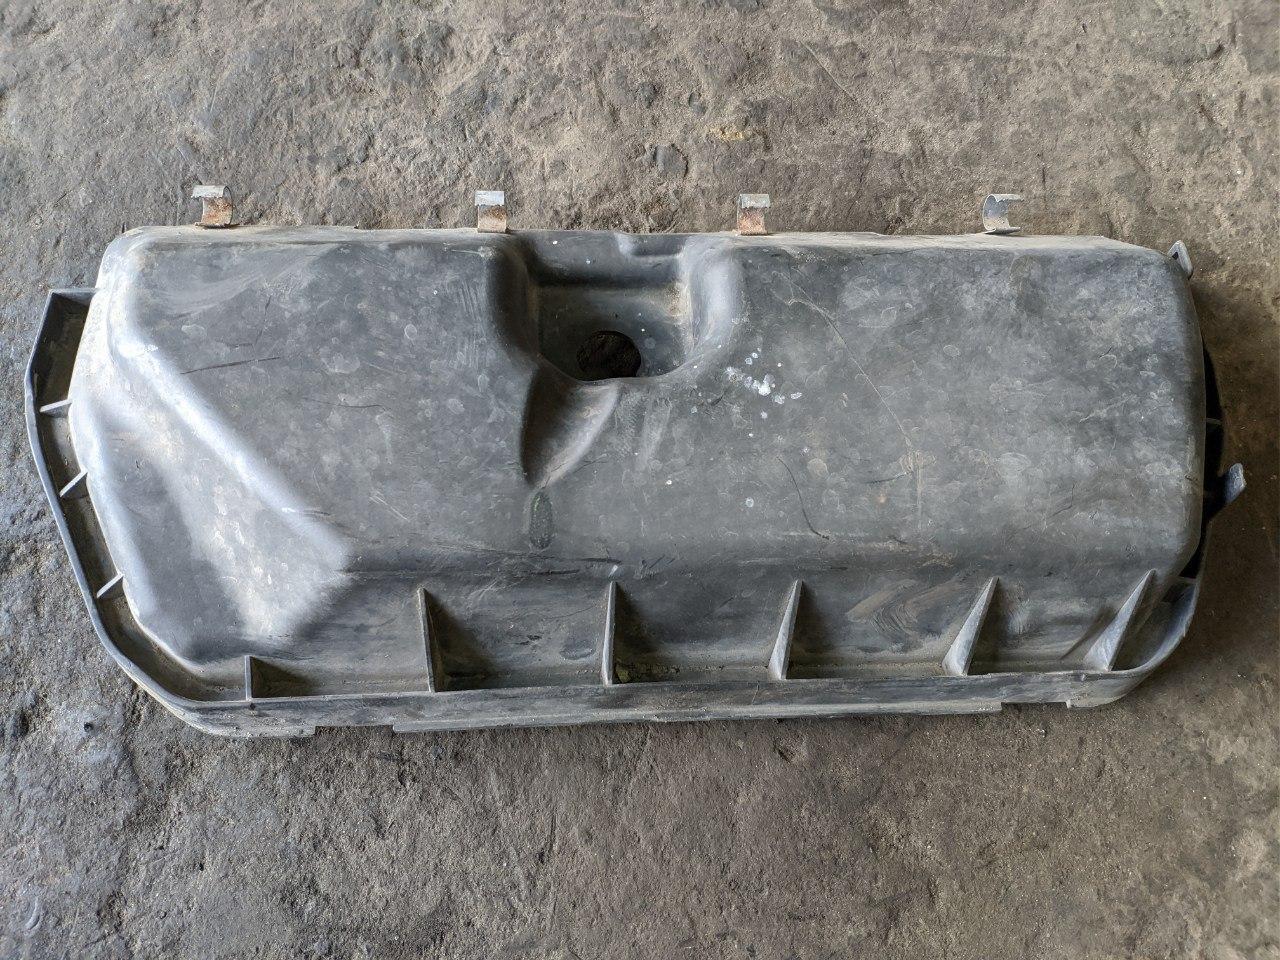 Крышка топливной рампы Renault Master, Opel Movano 2.2, 2.5, 1998-2010, 8200397655 (Б/У)